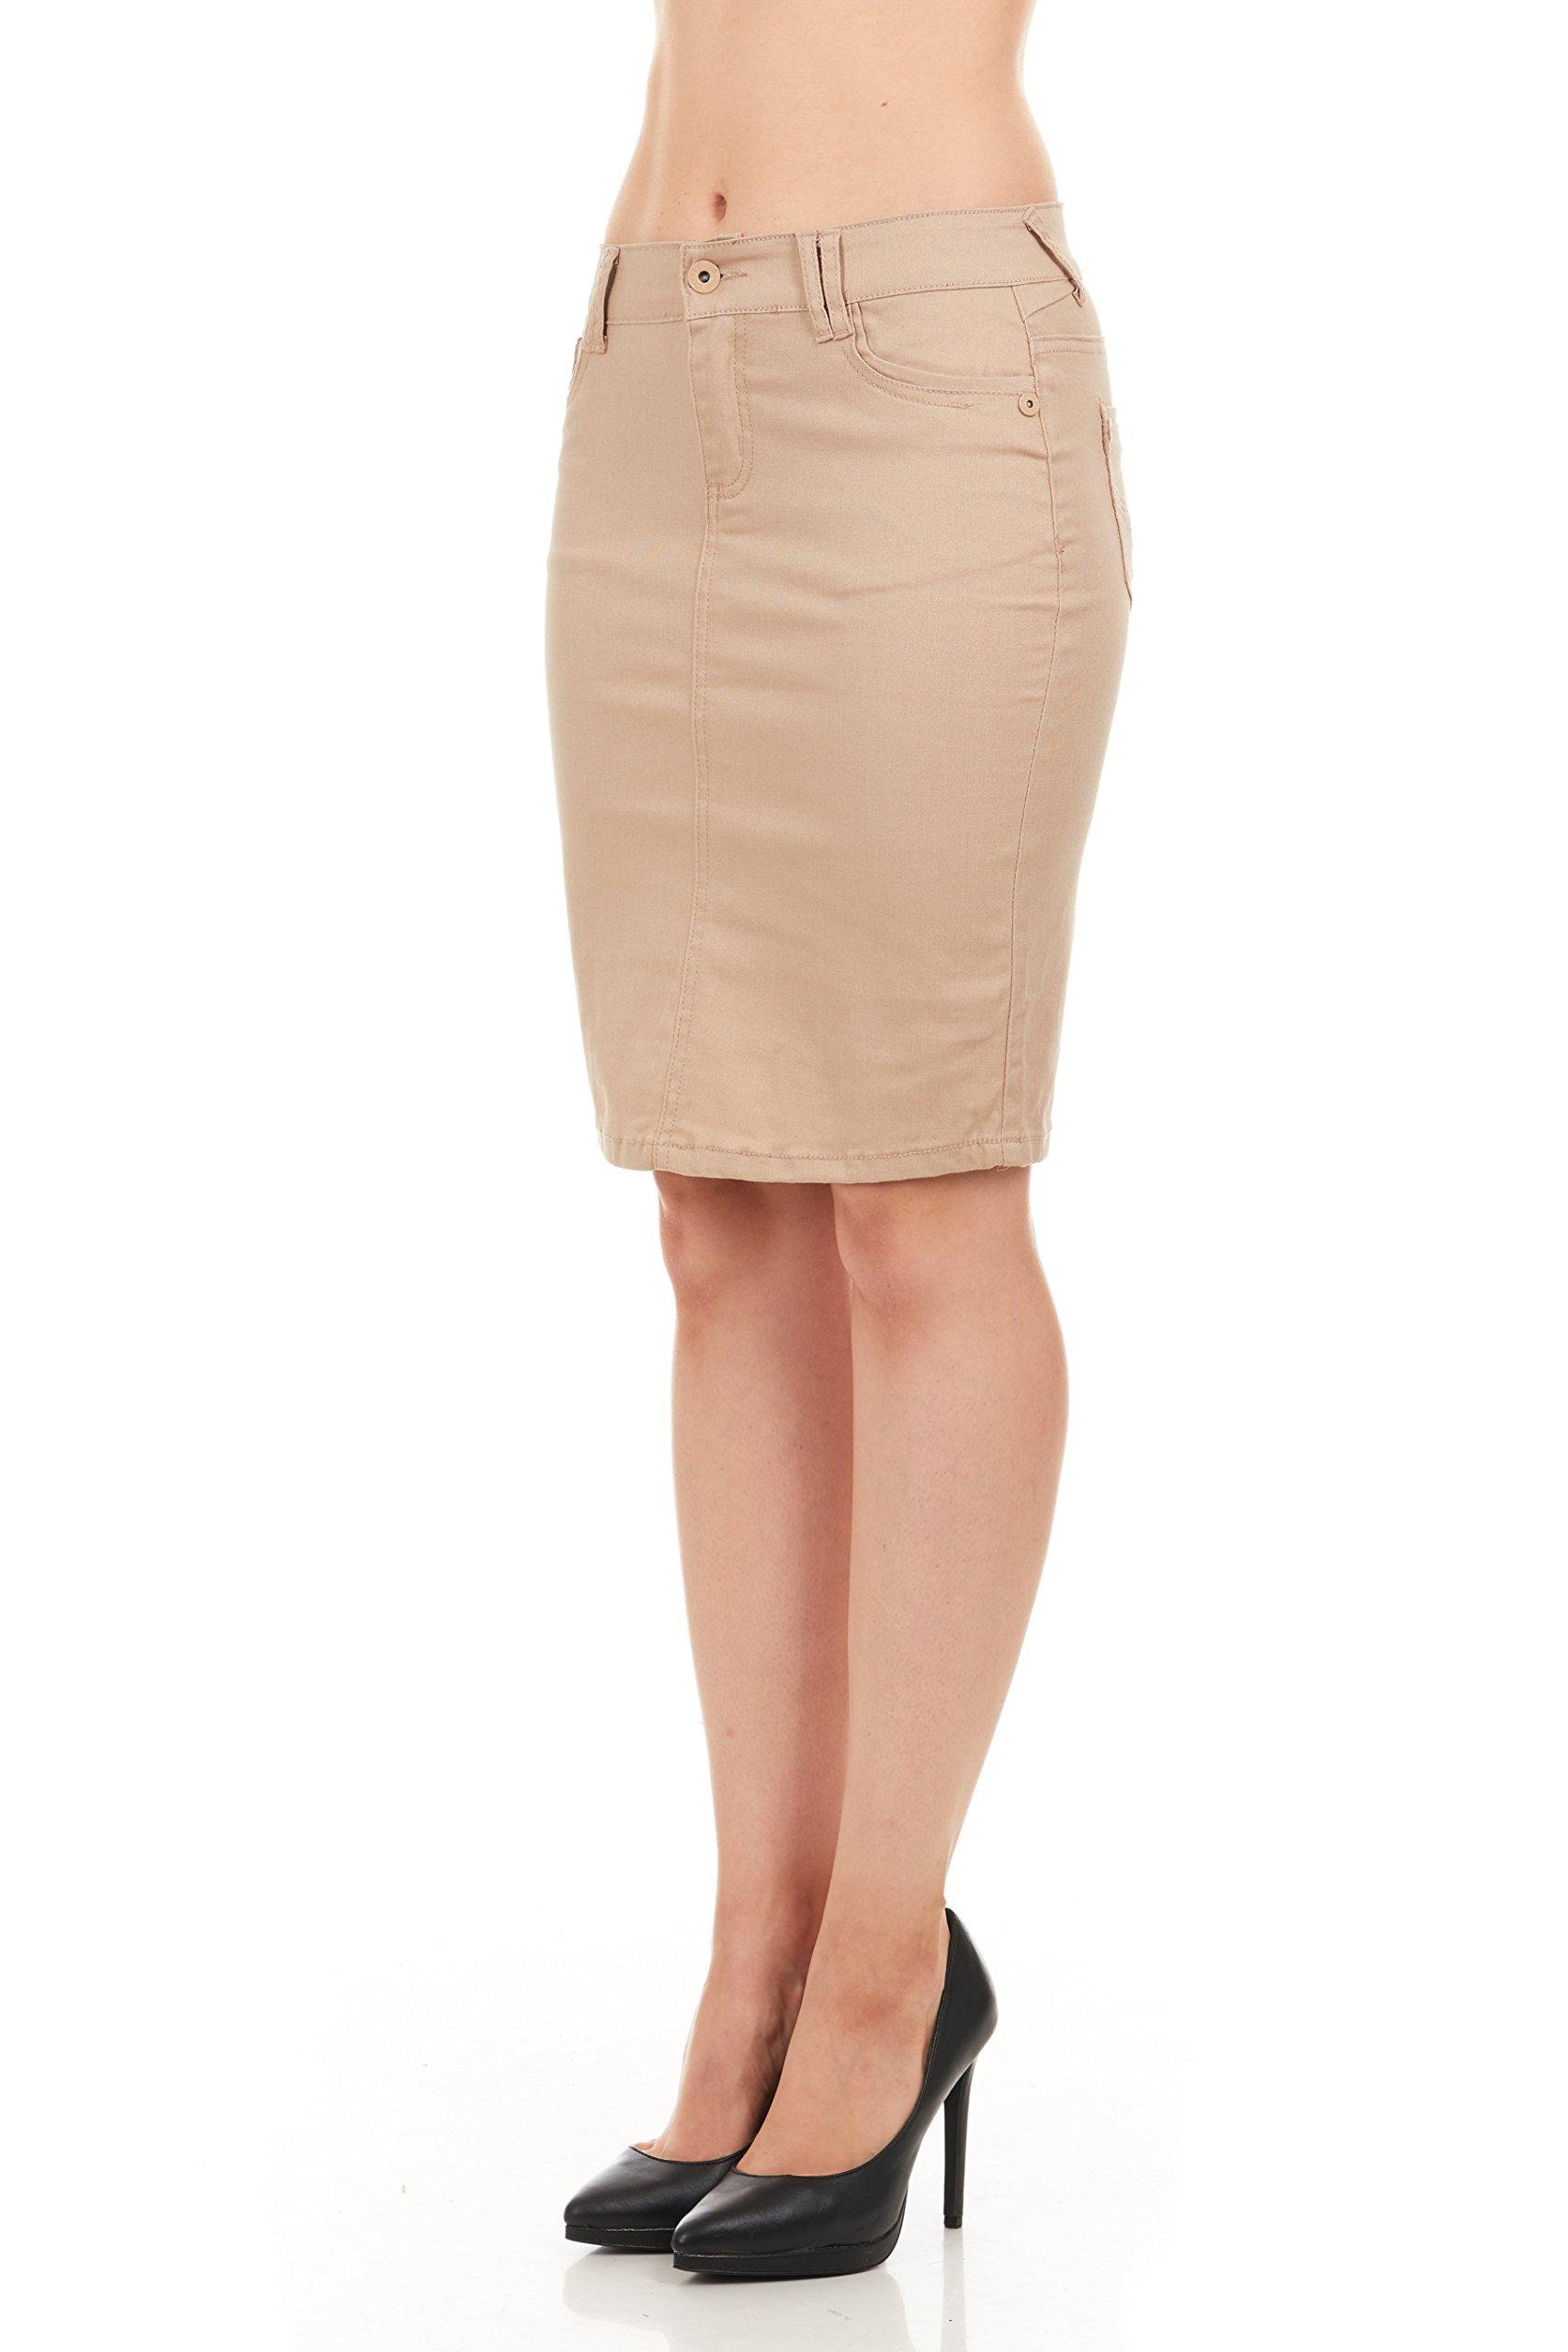 FGR Girl's Stertchy Cotton 5 Pocket Color Denim Skirt Khaki Size 12 by FGR (Image #4)